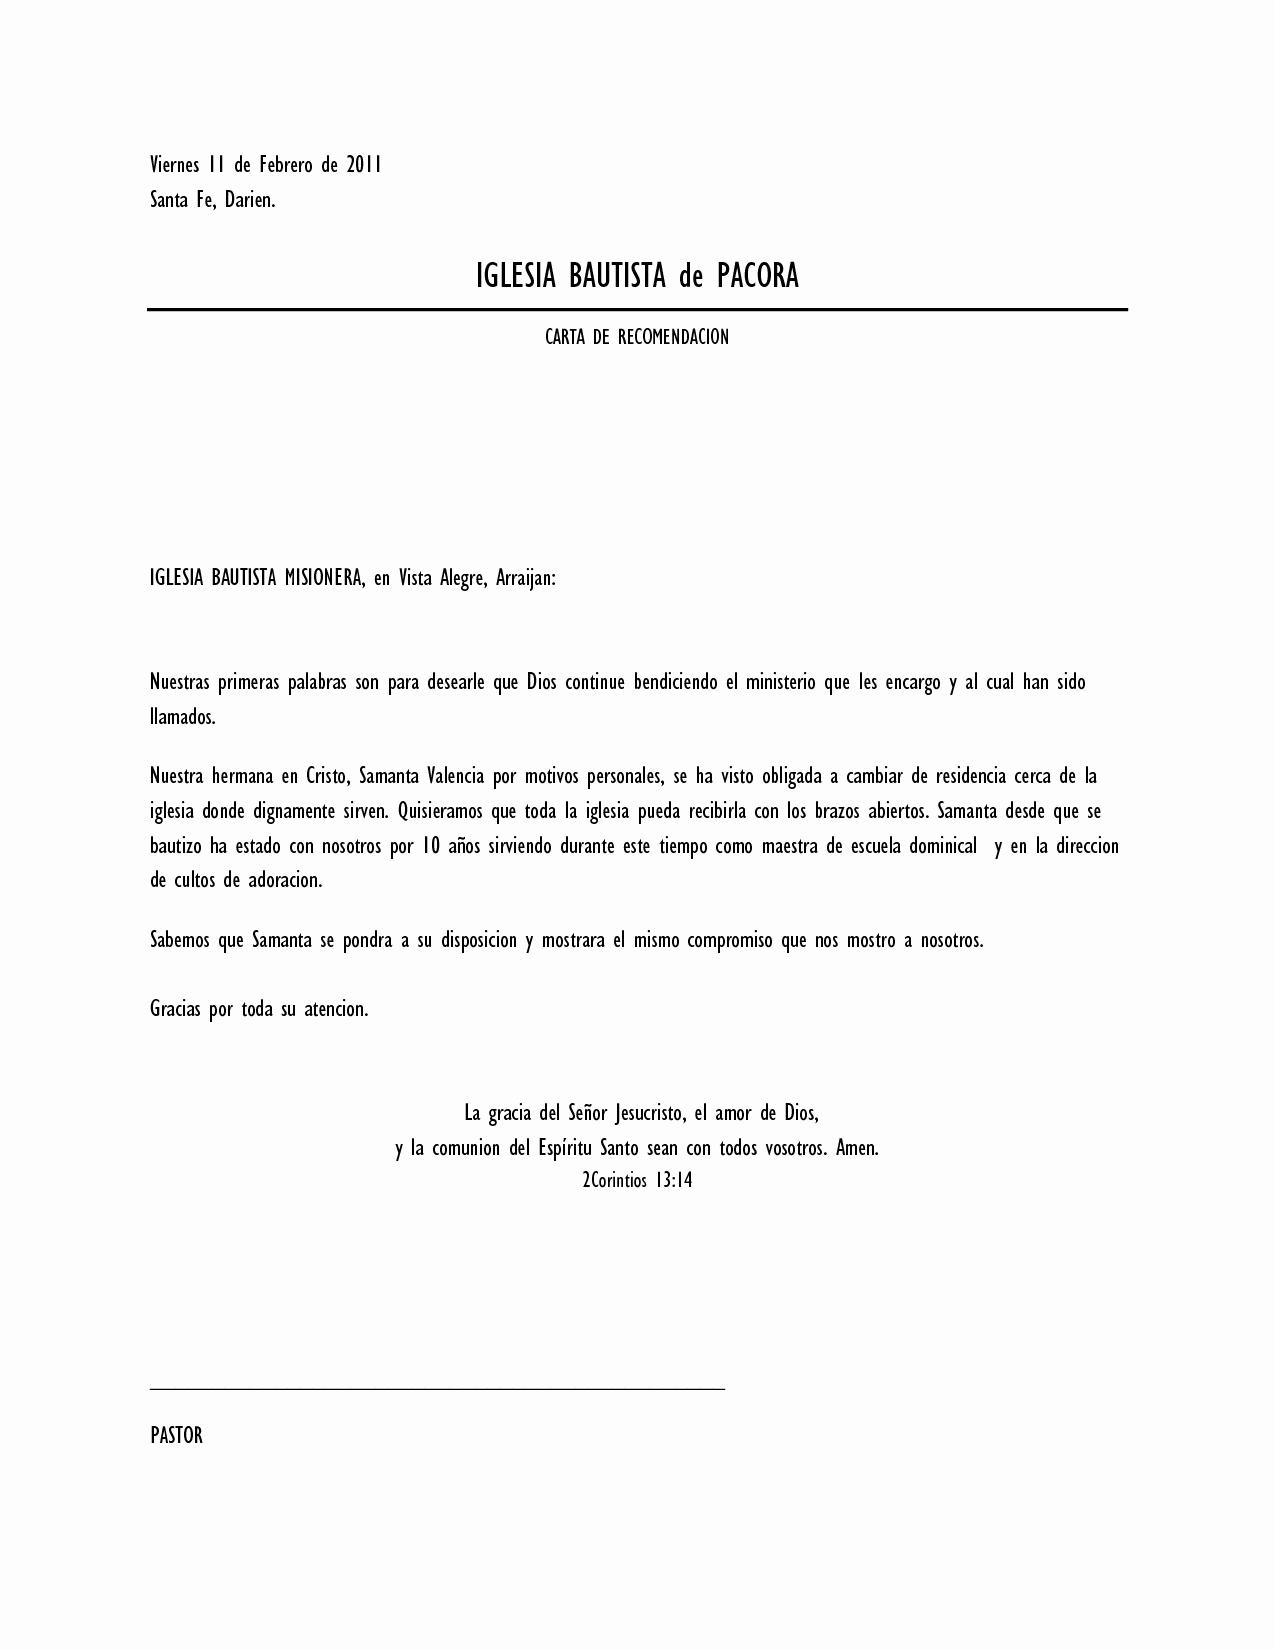 Machote Carta De Recomendacion Personal Fresh Cartas De Re Endacion Personal Imagui